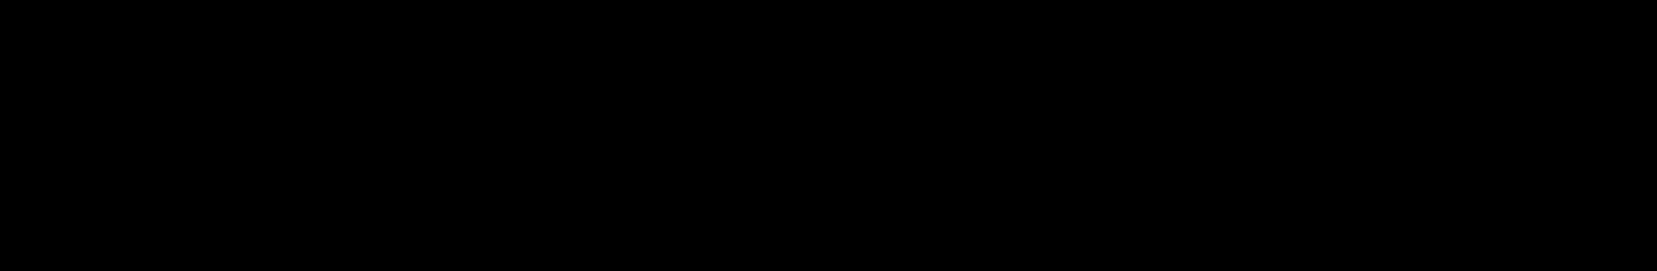 Nanogen